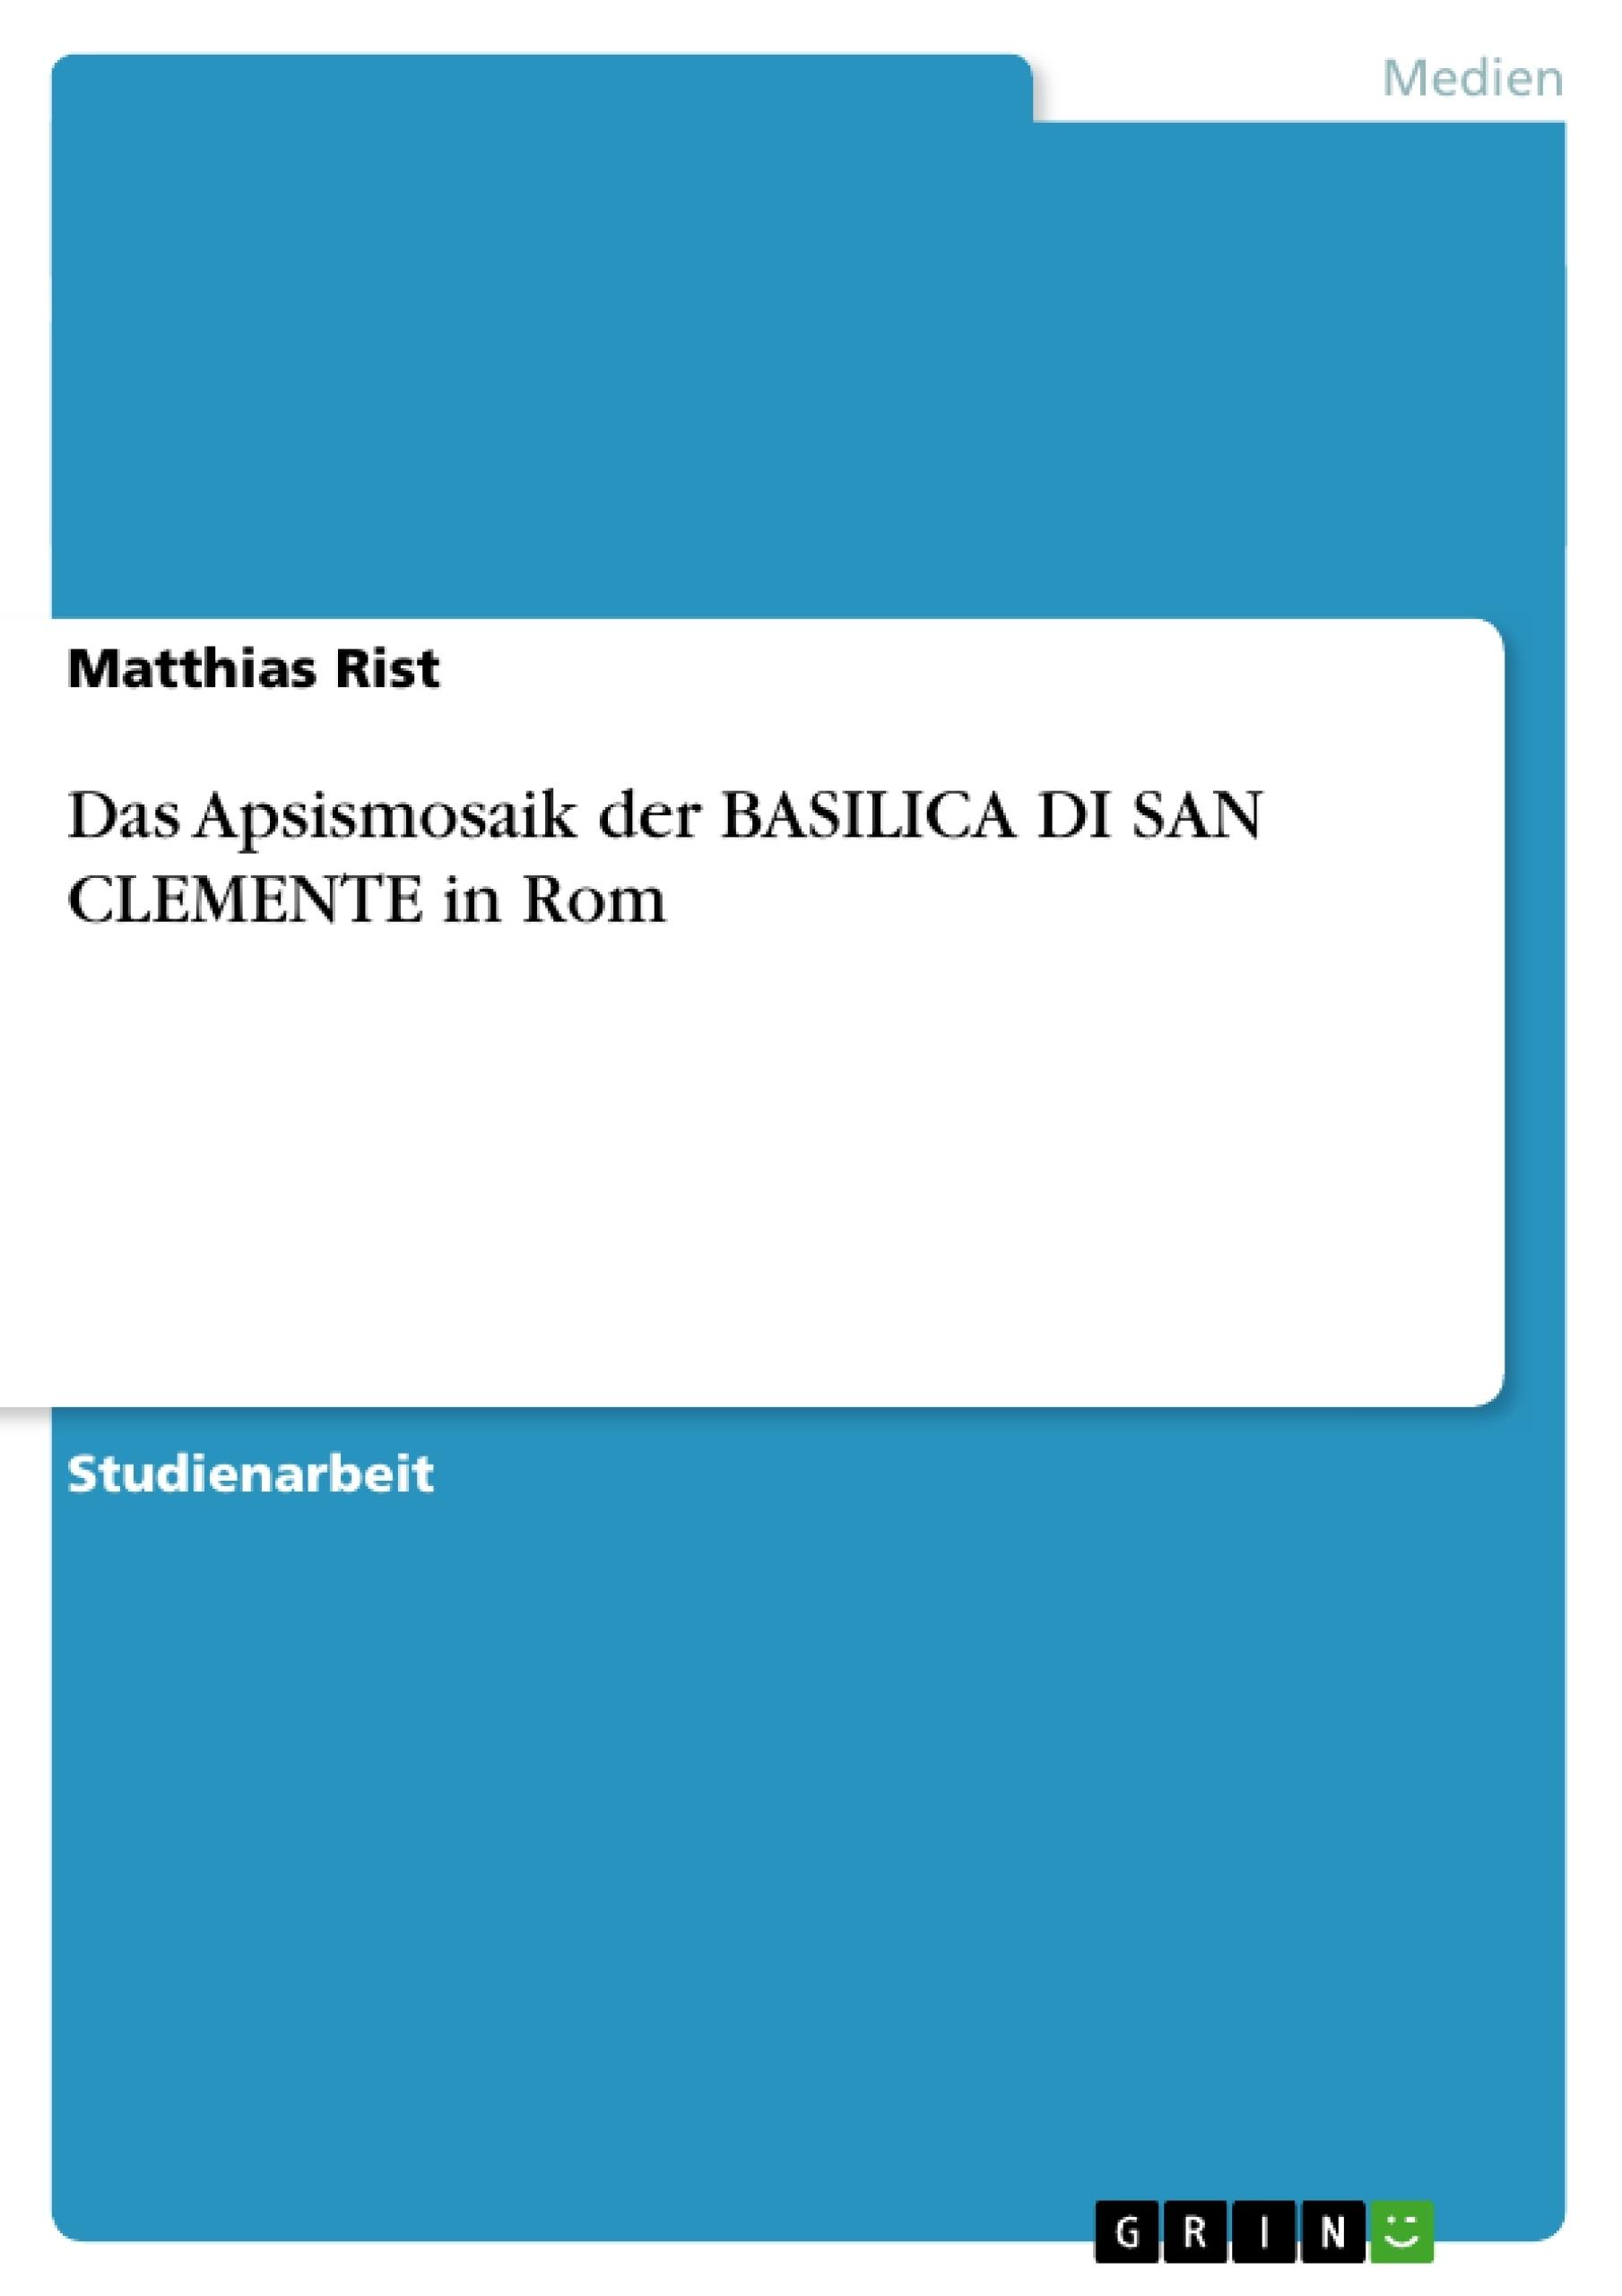 Titel: Das Apsismosaik der BASILICA DI SAN CLEMENTE in Rom